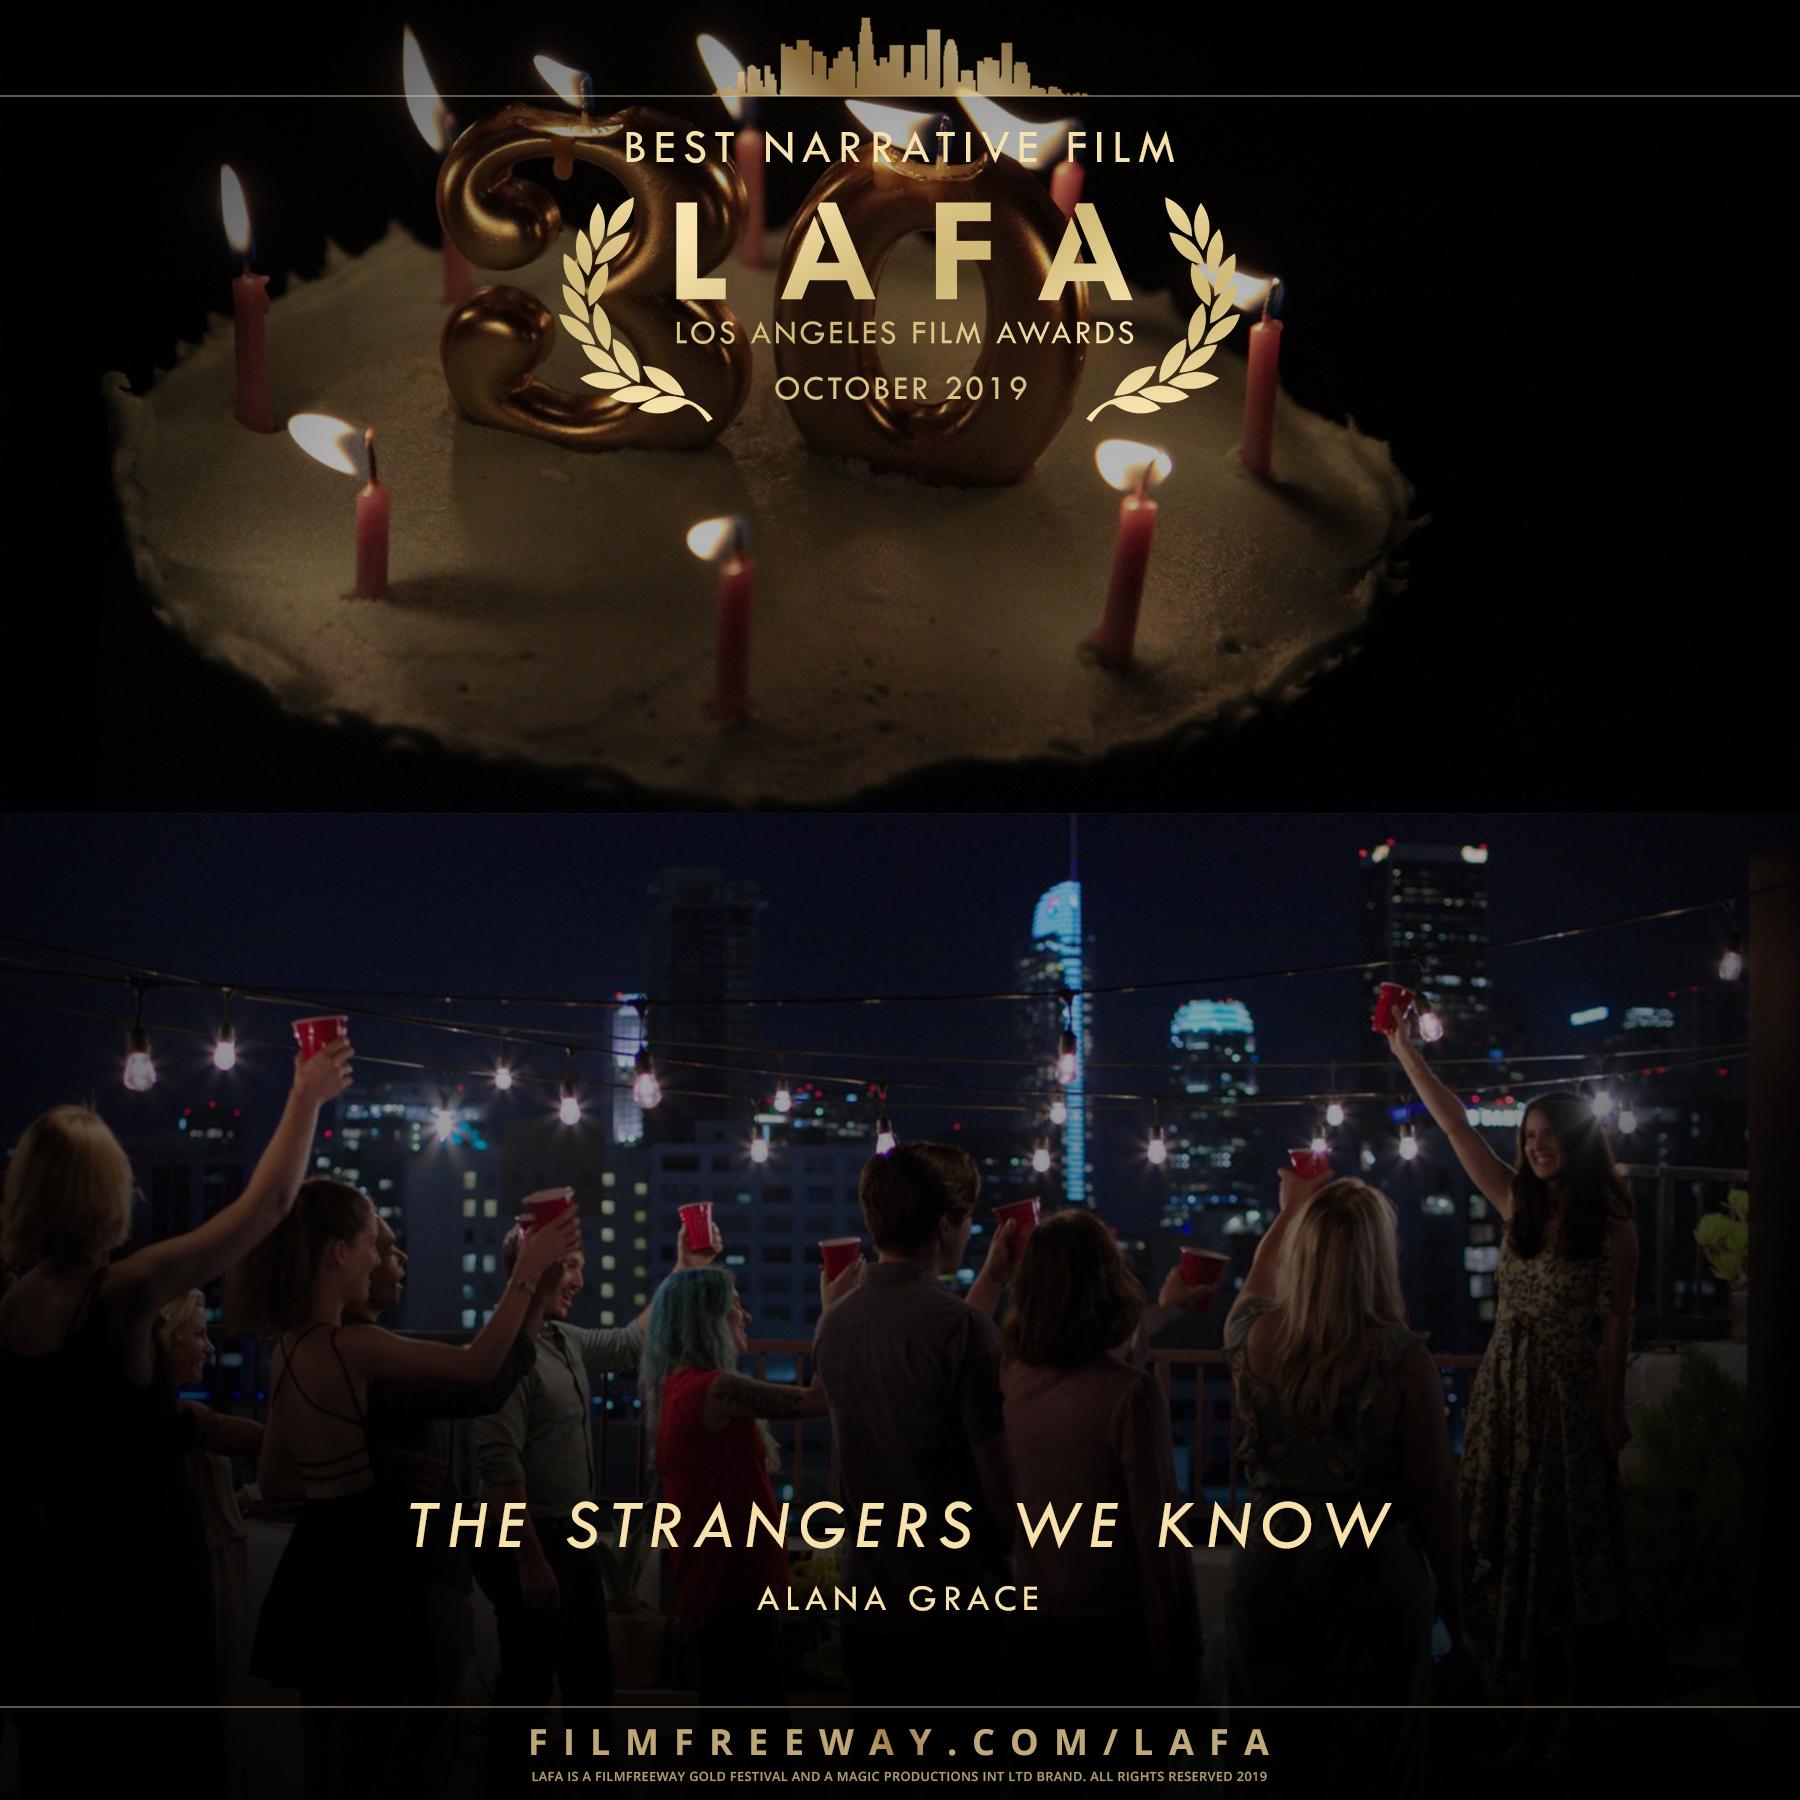 The Strangers We Know design